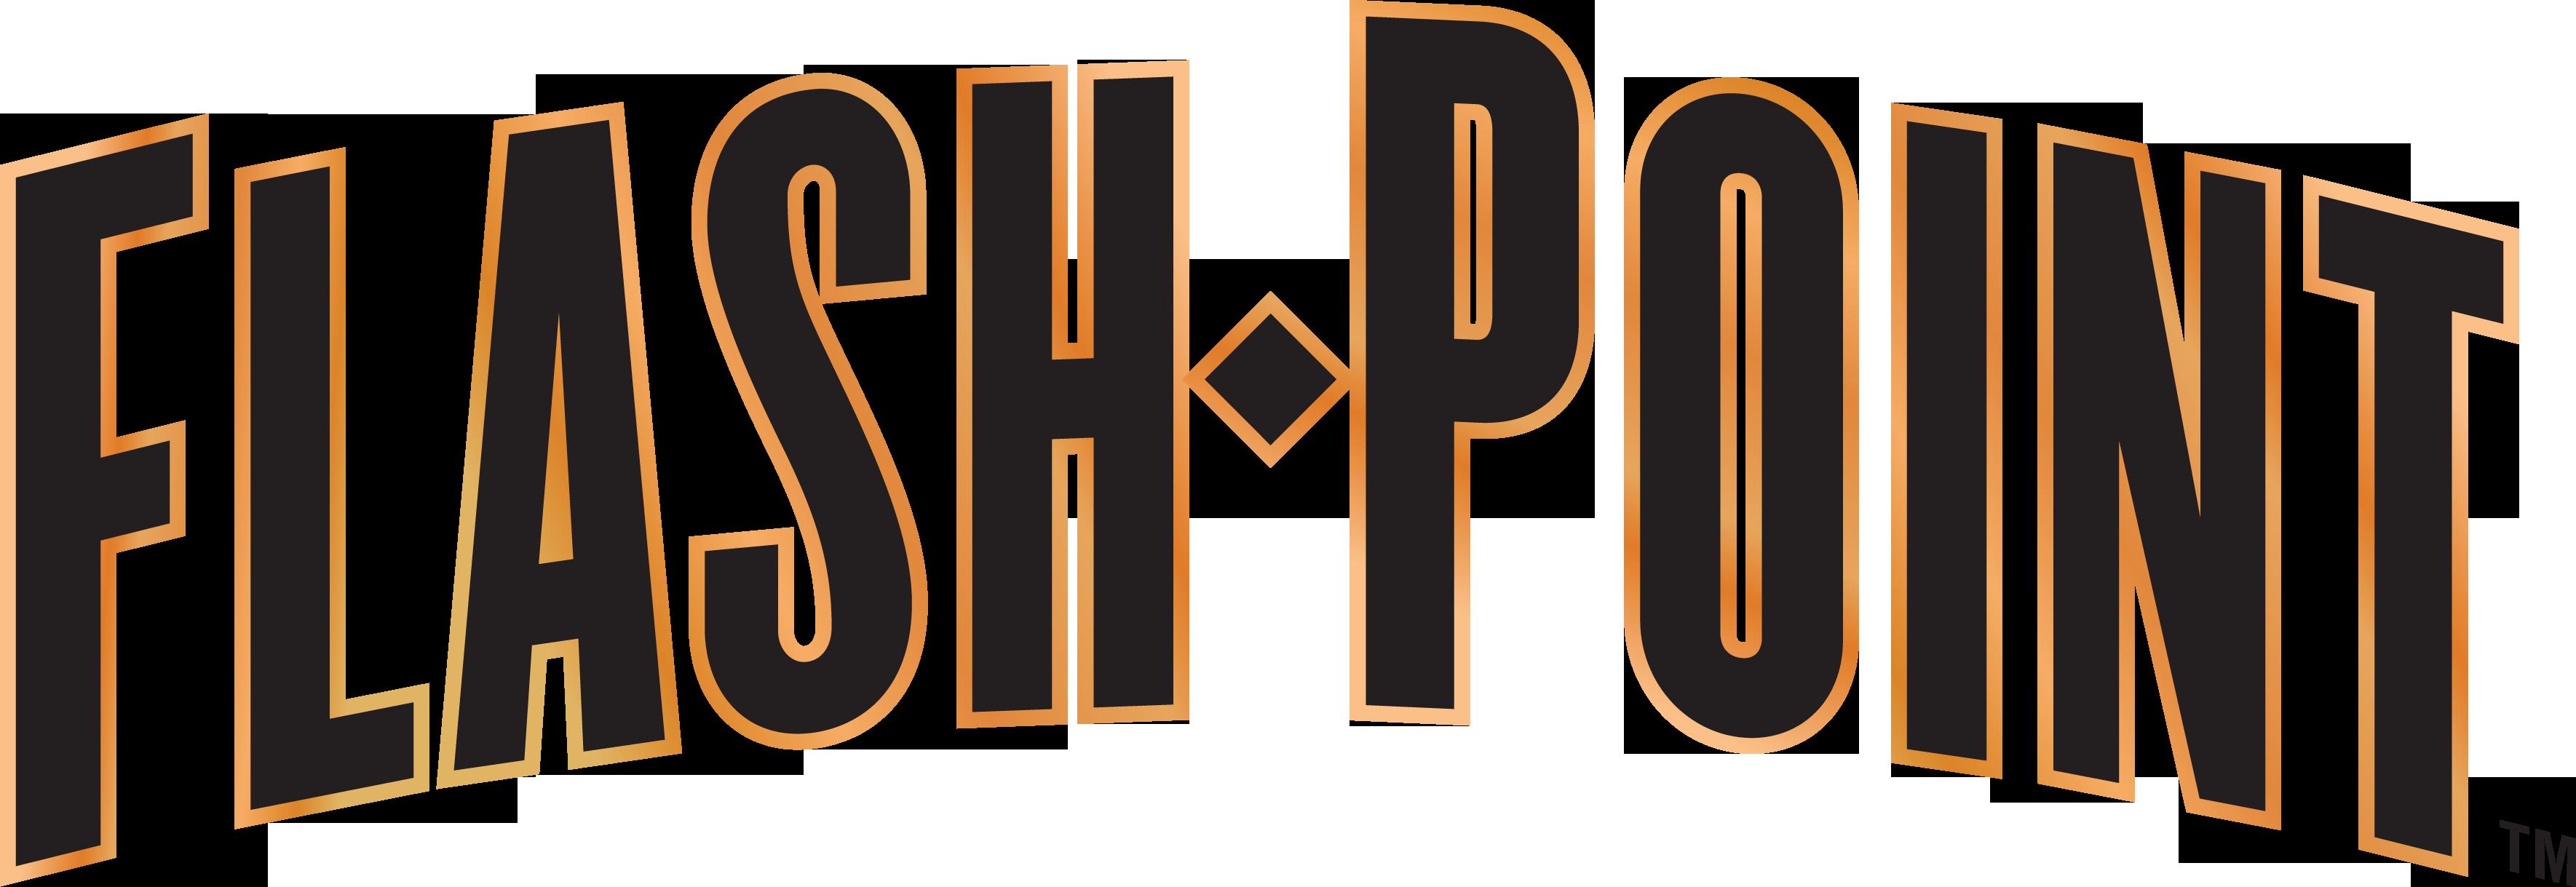 FLASH-POINT WINE-BASED CINNAMON WHISKEY